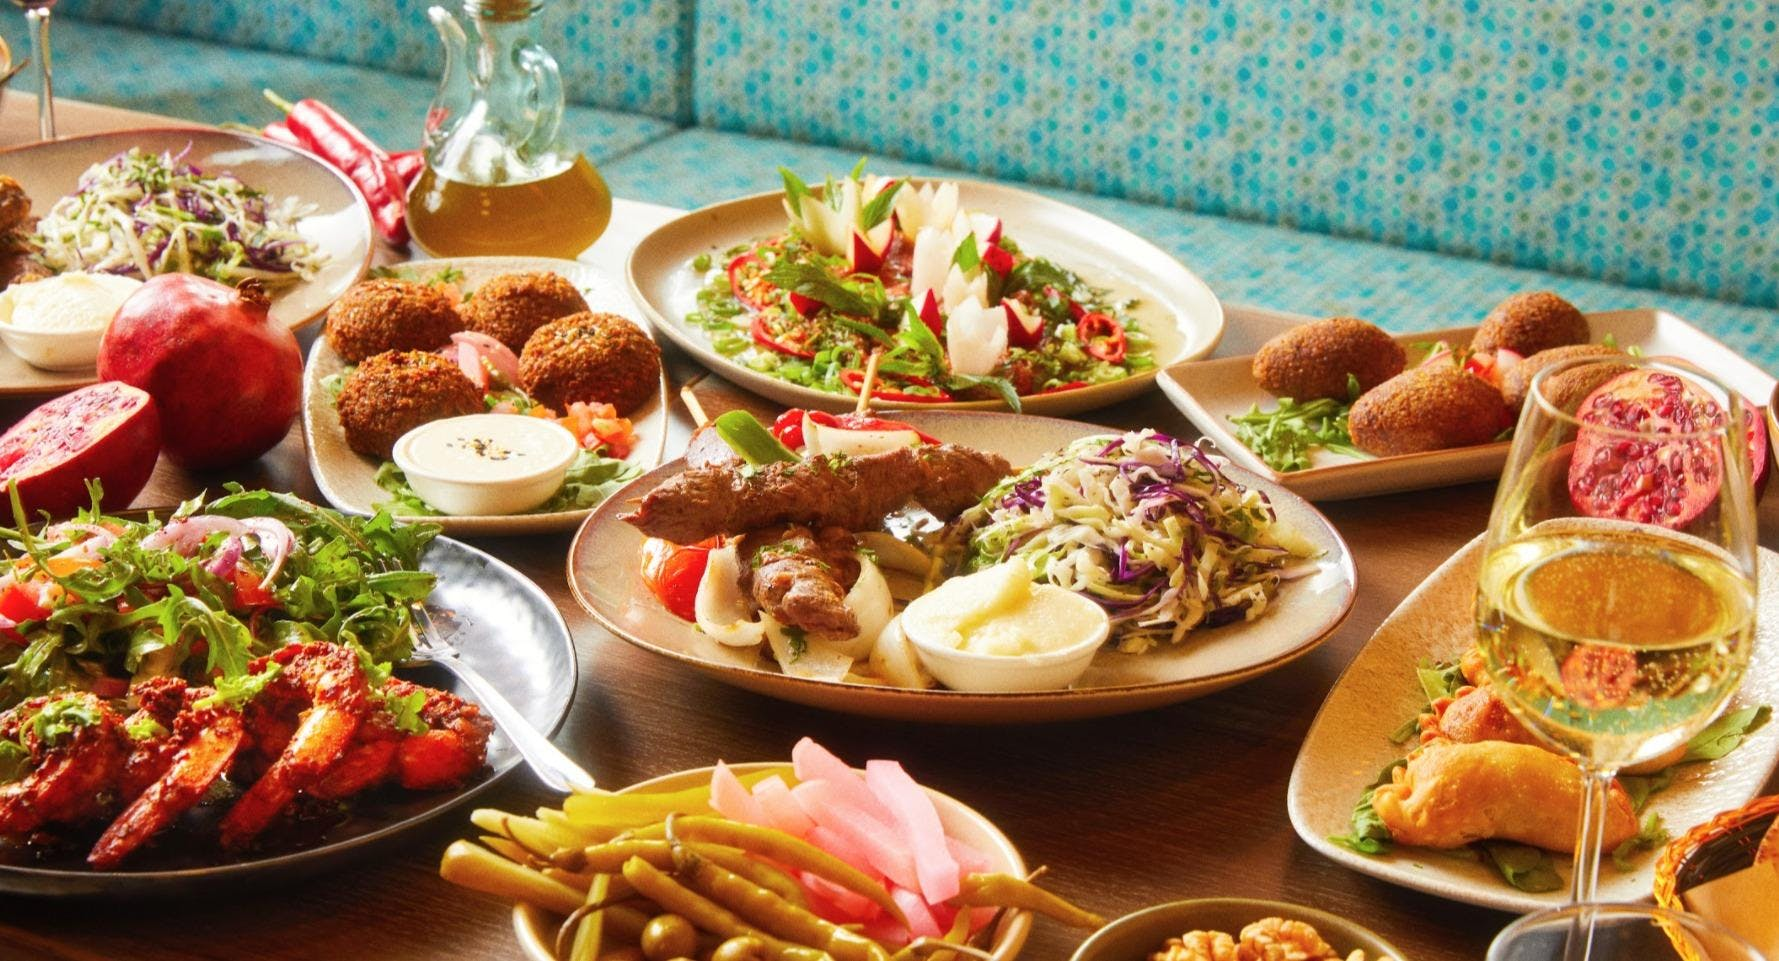 Photo of restaurant Baba Ghanouj - Dural in Dural, Sydney